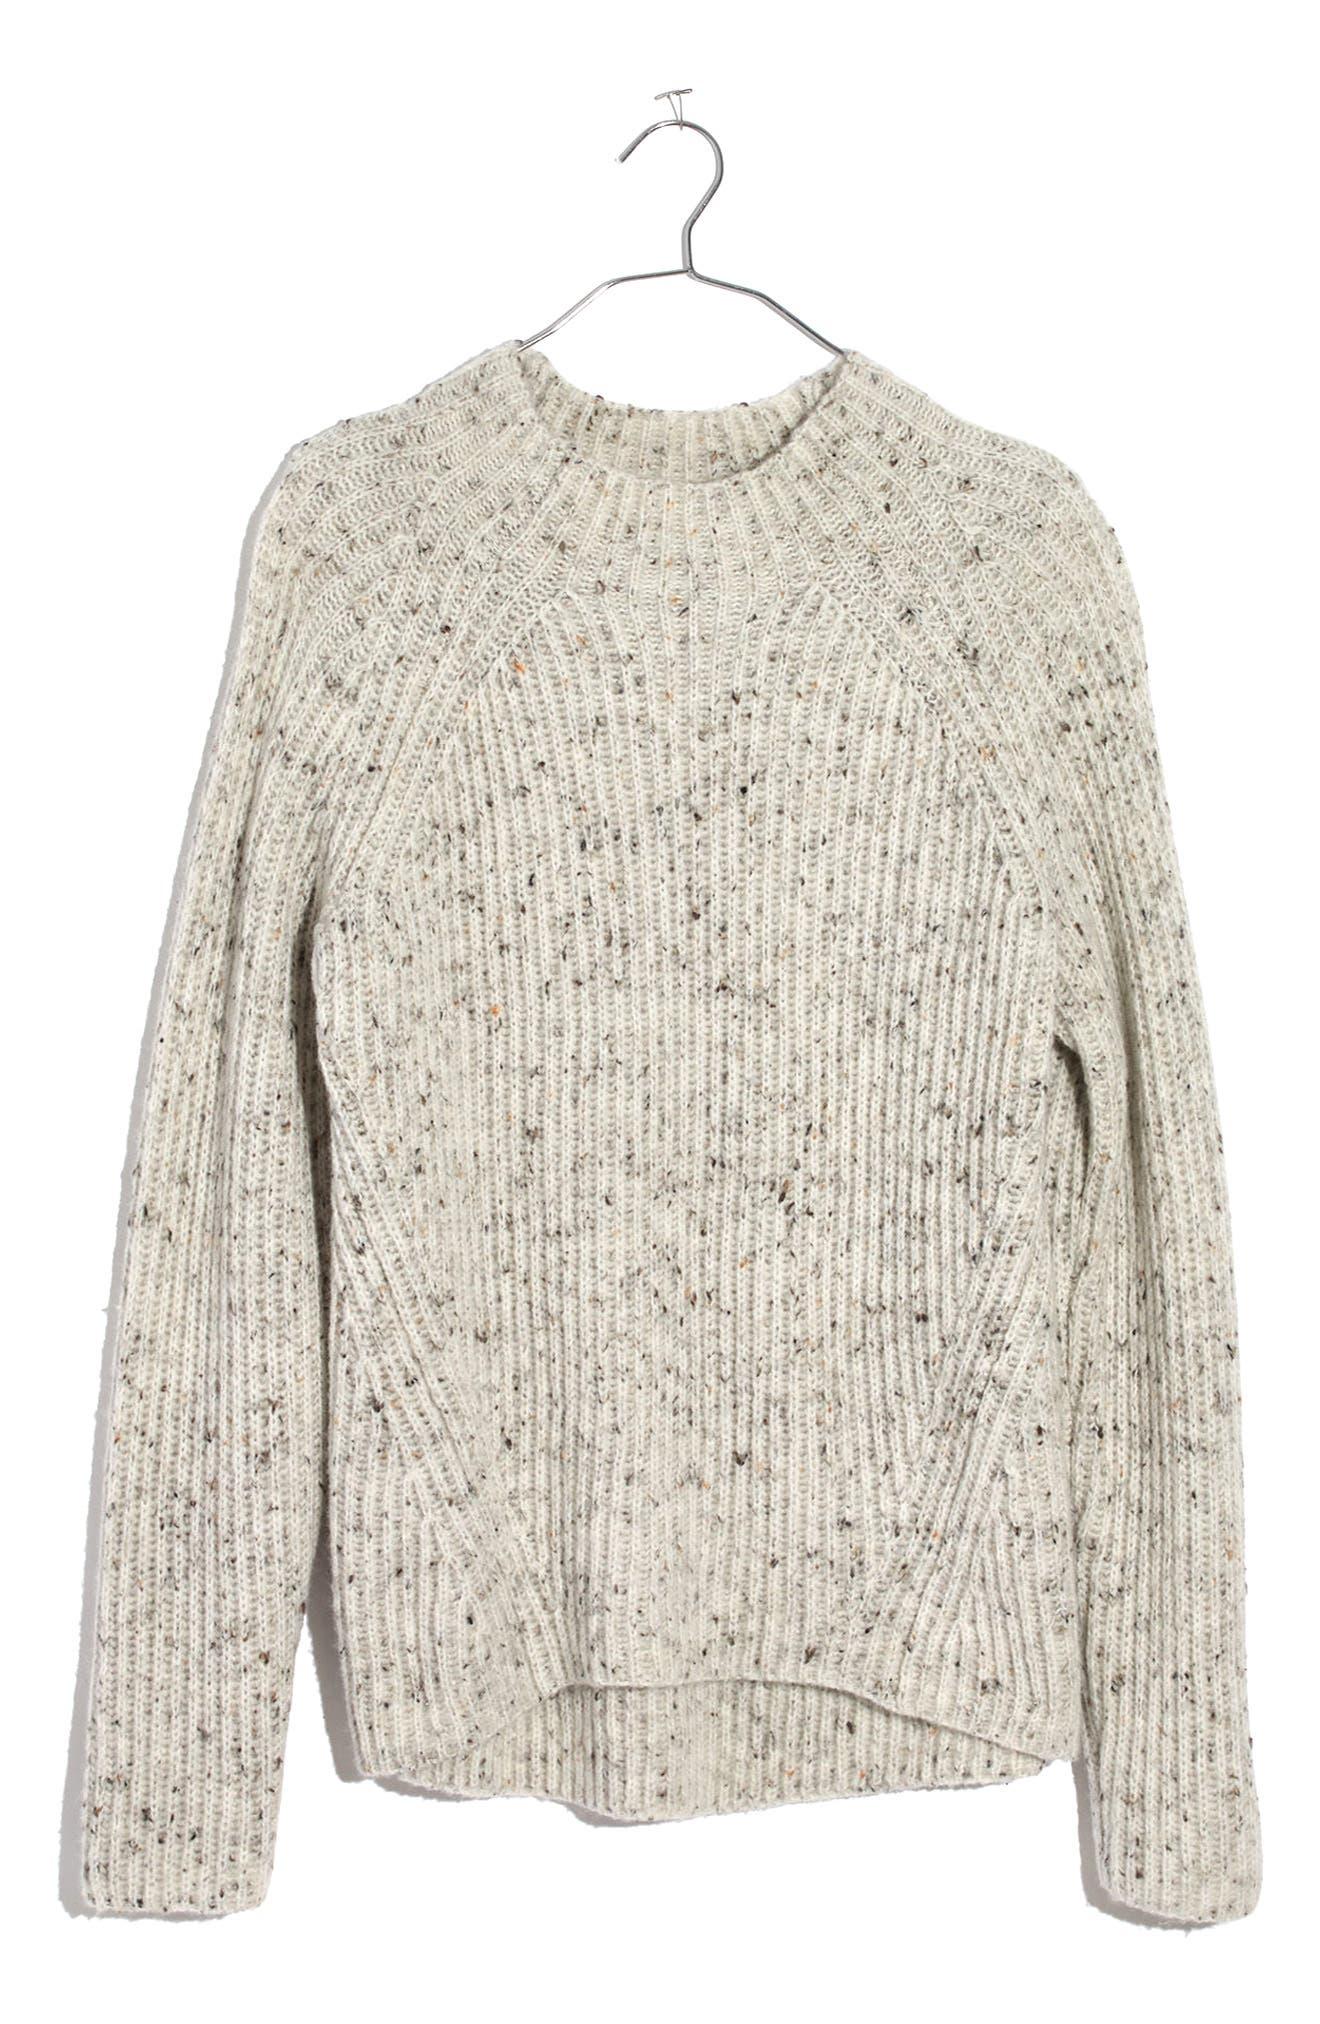 Donegal Northfield Mockneck Sweater,                             Alternate thumbnail 3, color,                             100